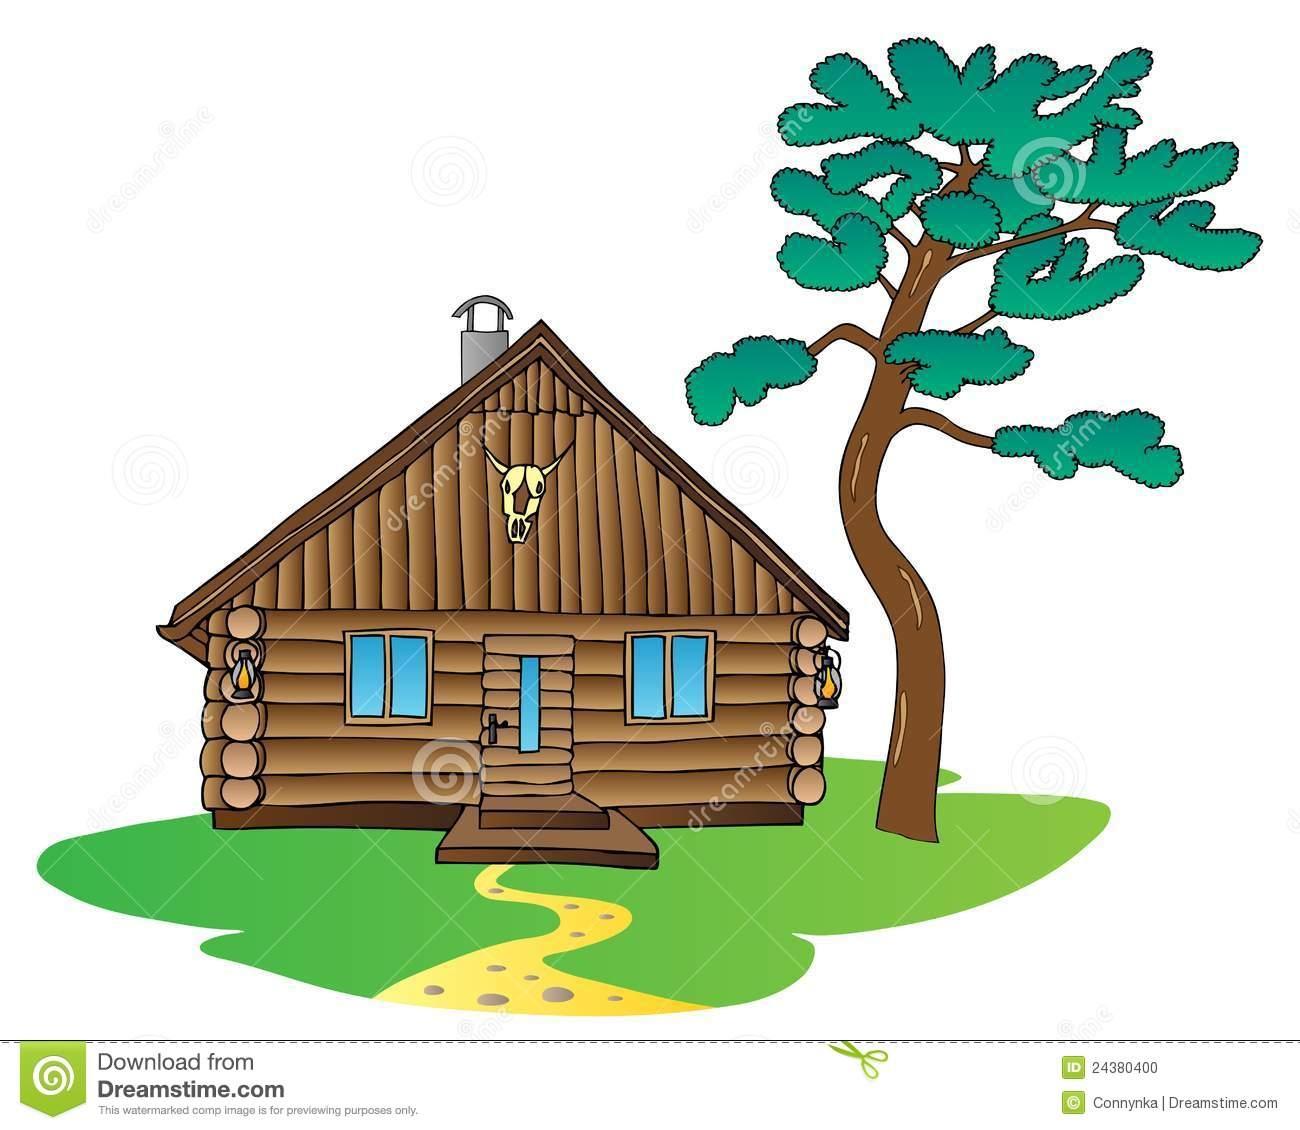 Best of design digital. Camp clipart cabin